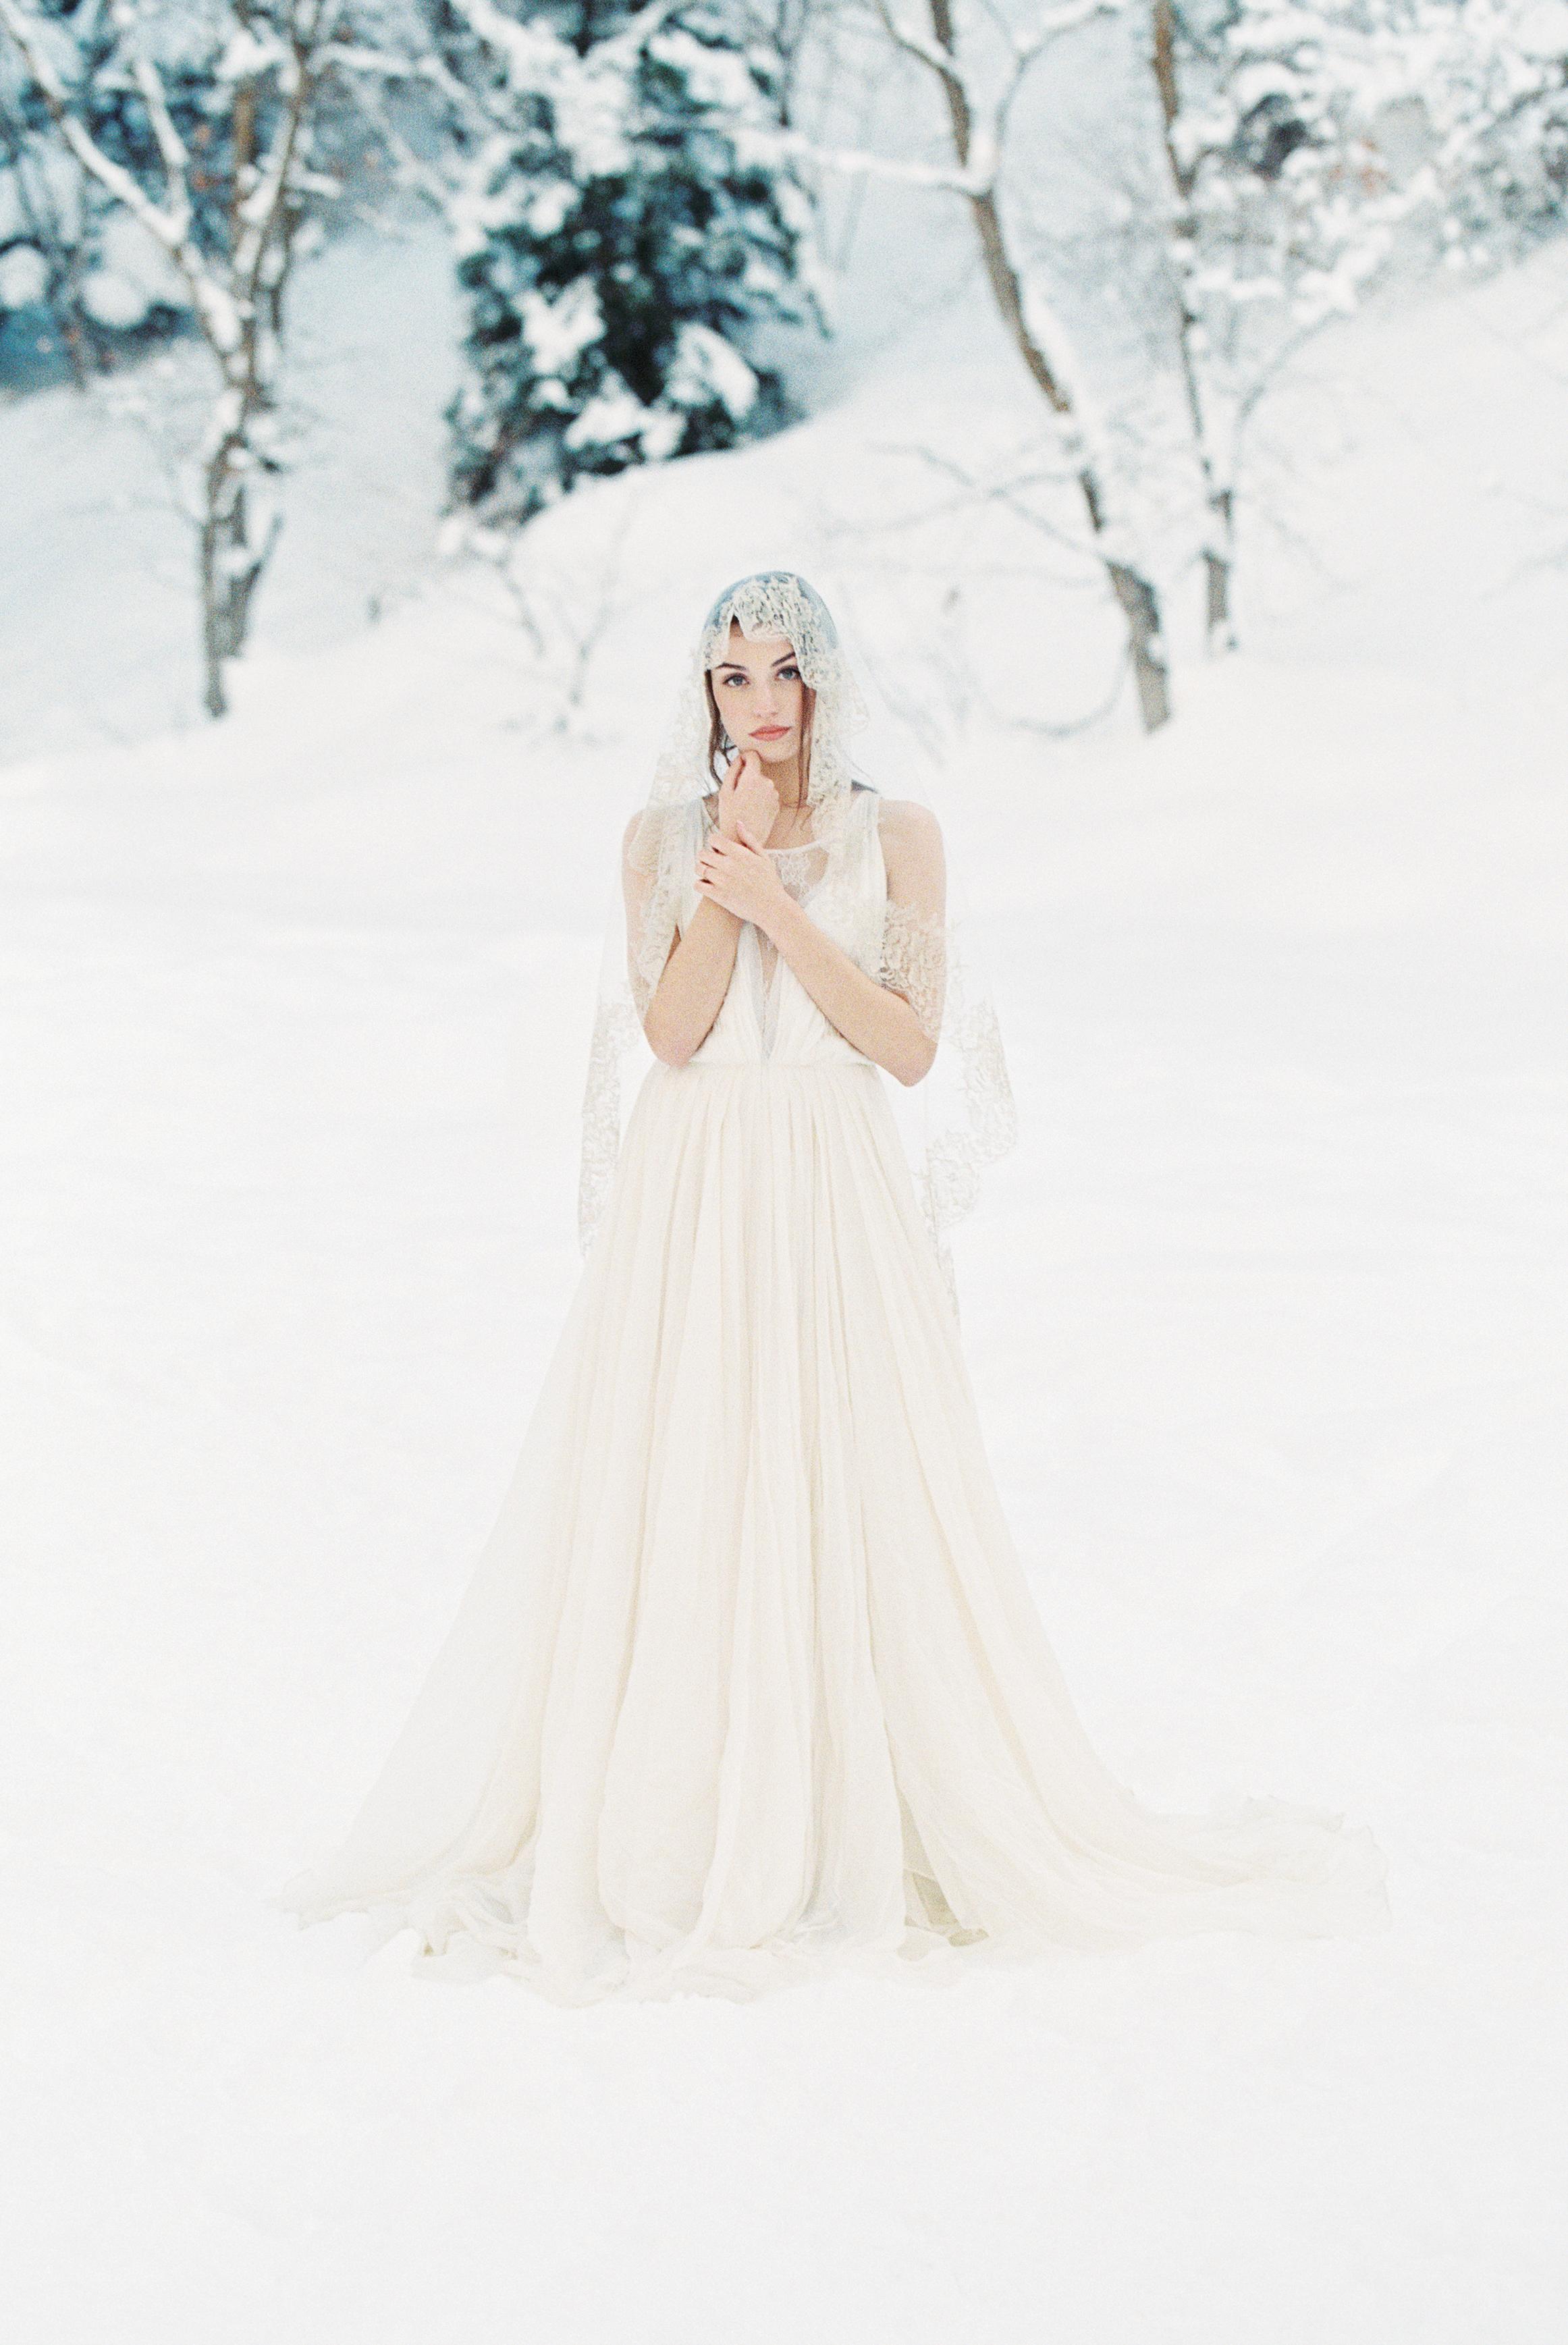 BellaCosa_WinterWonderland-126.jpg